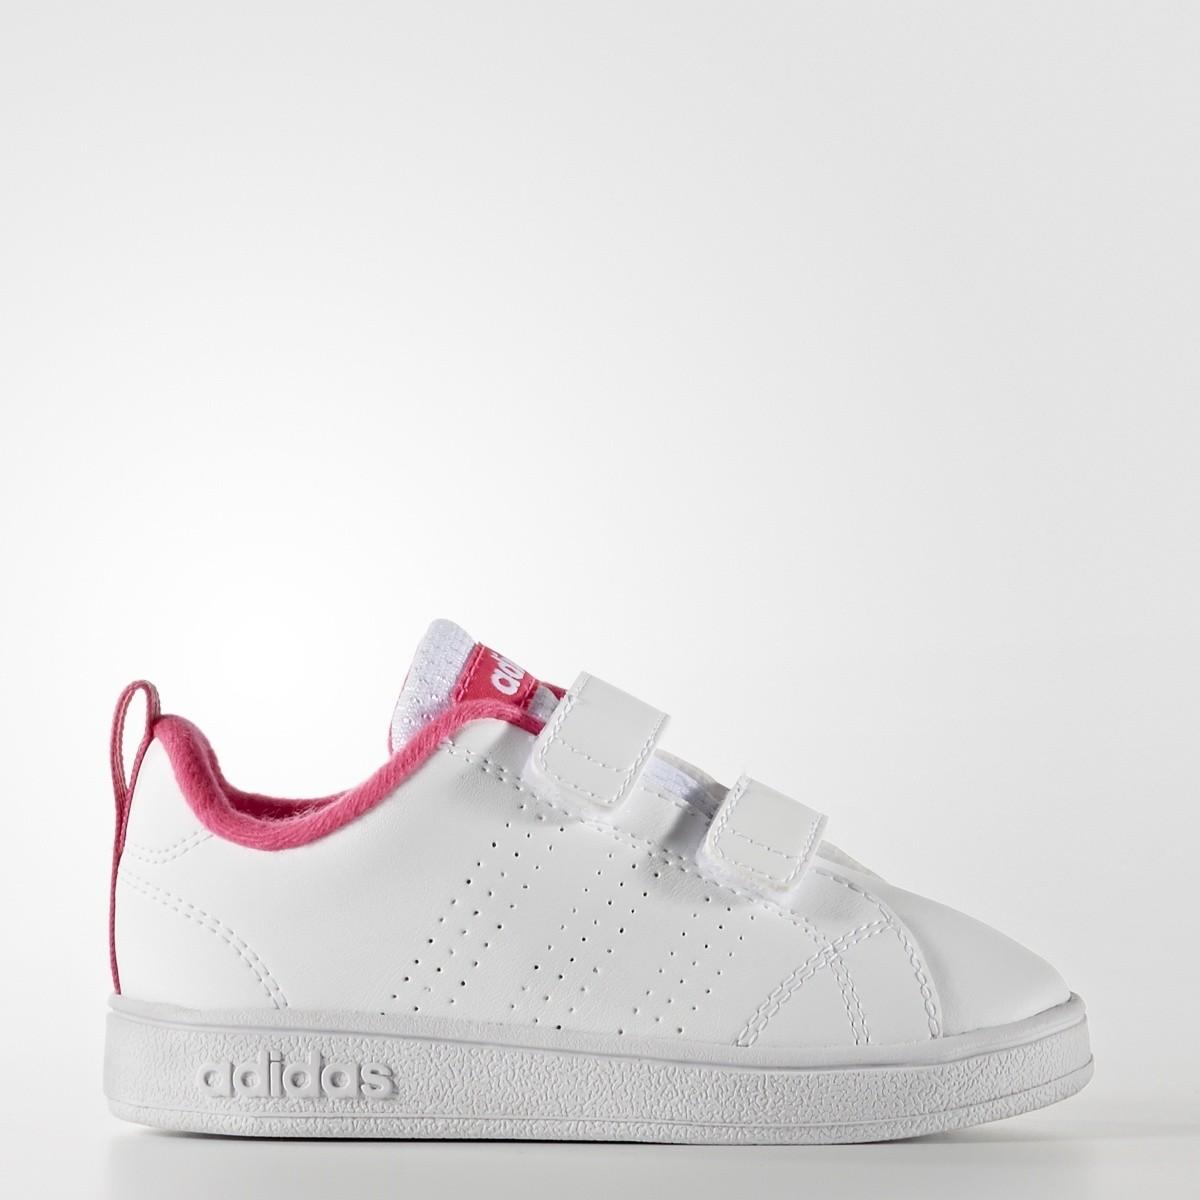 Dětské boty adidas Originals VS ADVANTAGE CLEAN CMF INF  b78f0e8e35